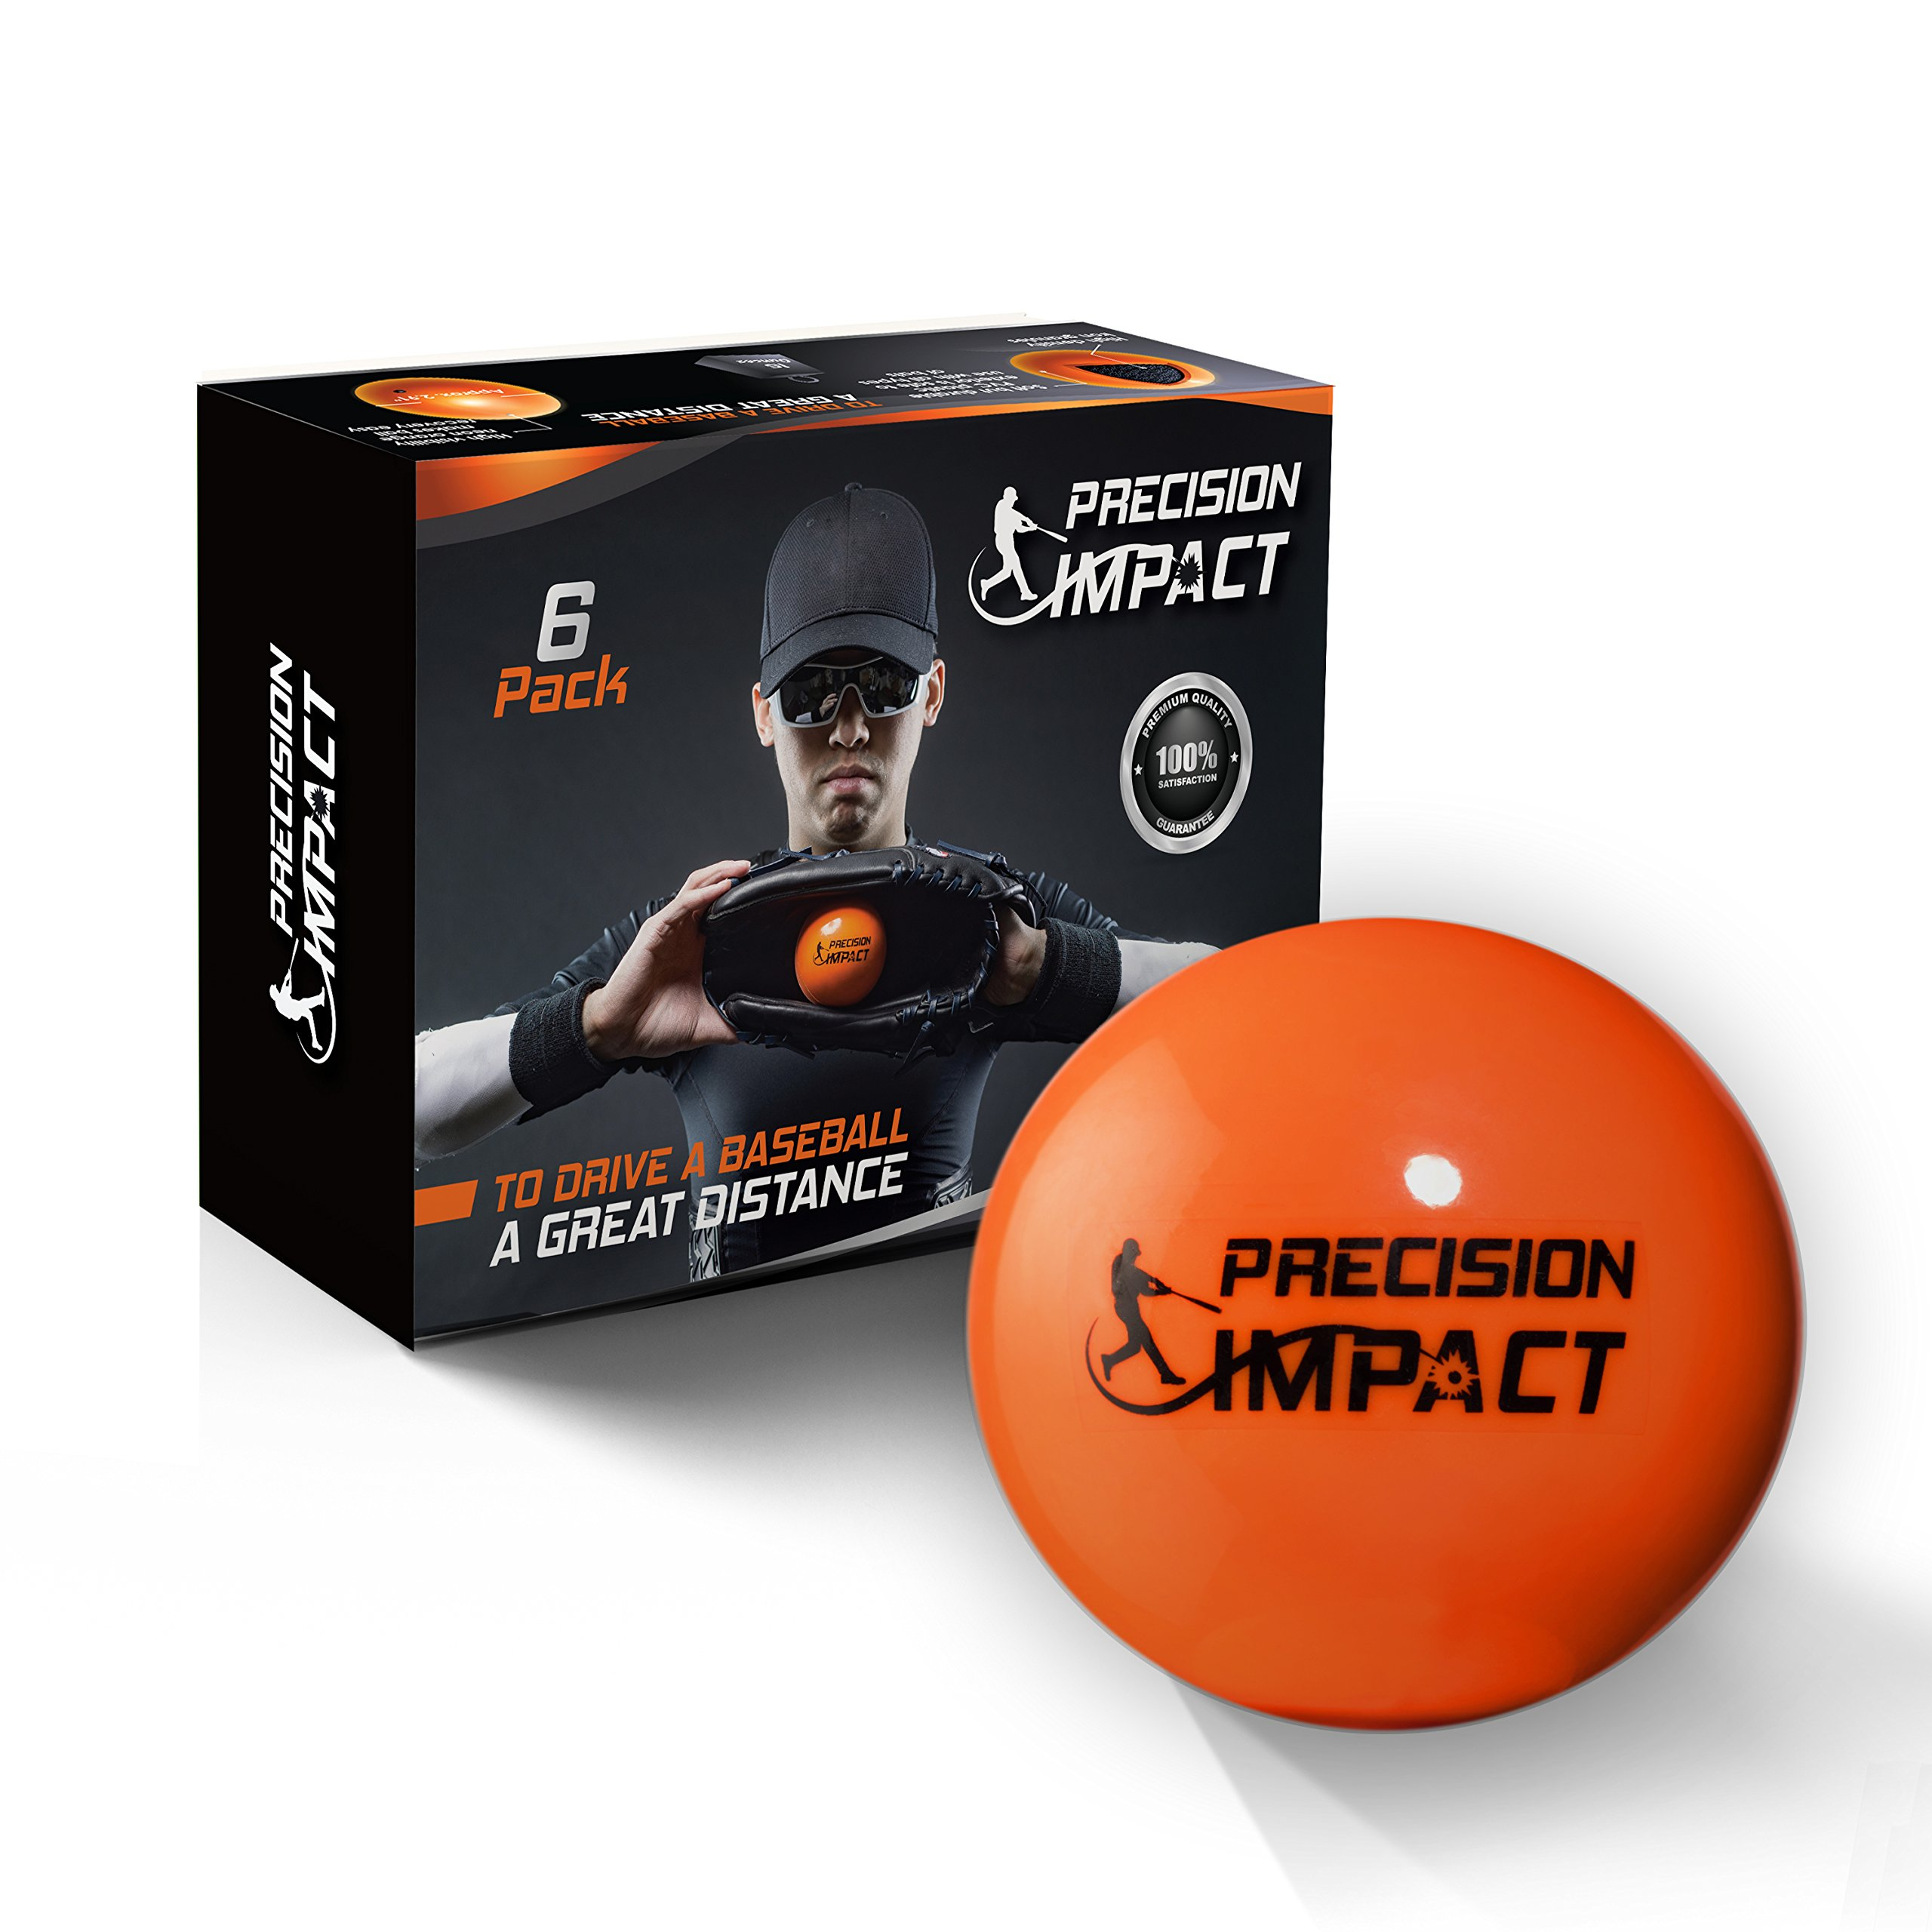 Precision Impact Baseball-Size Slugs: Heavy Weighted Practice Balls for Baseball; Hitting Training Aid (6-Pack)